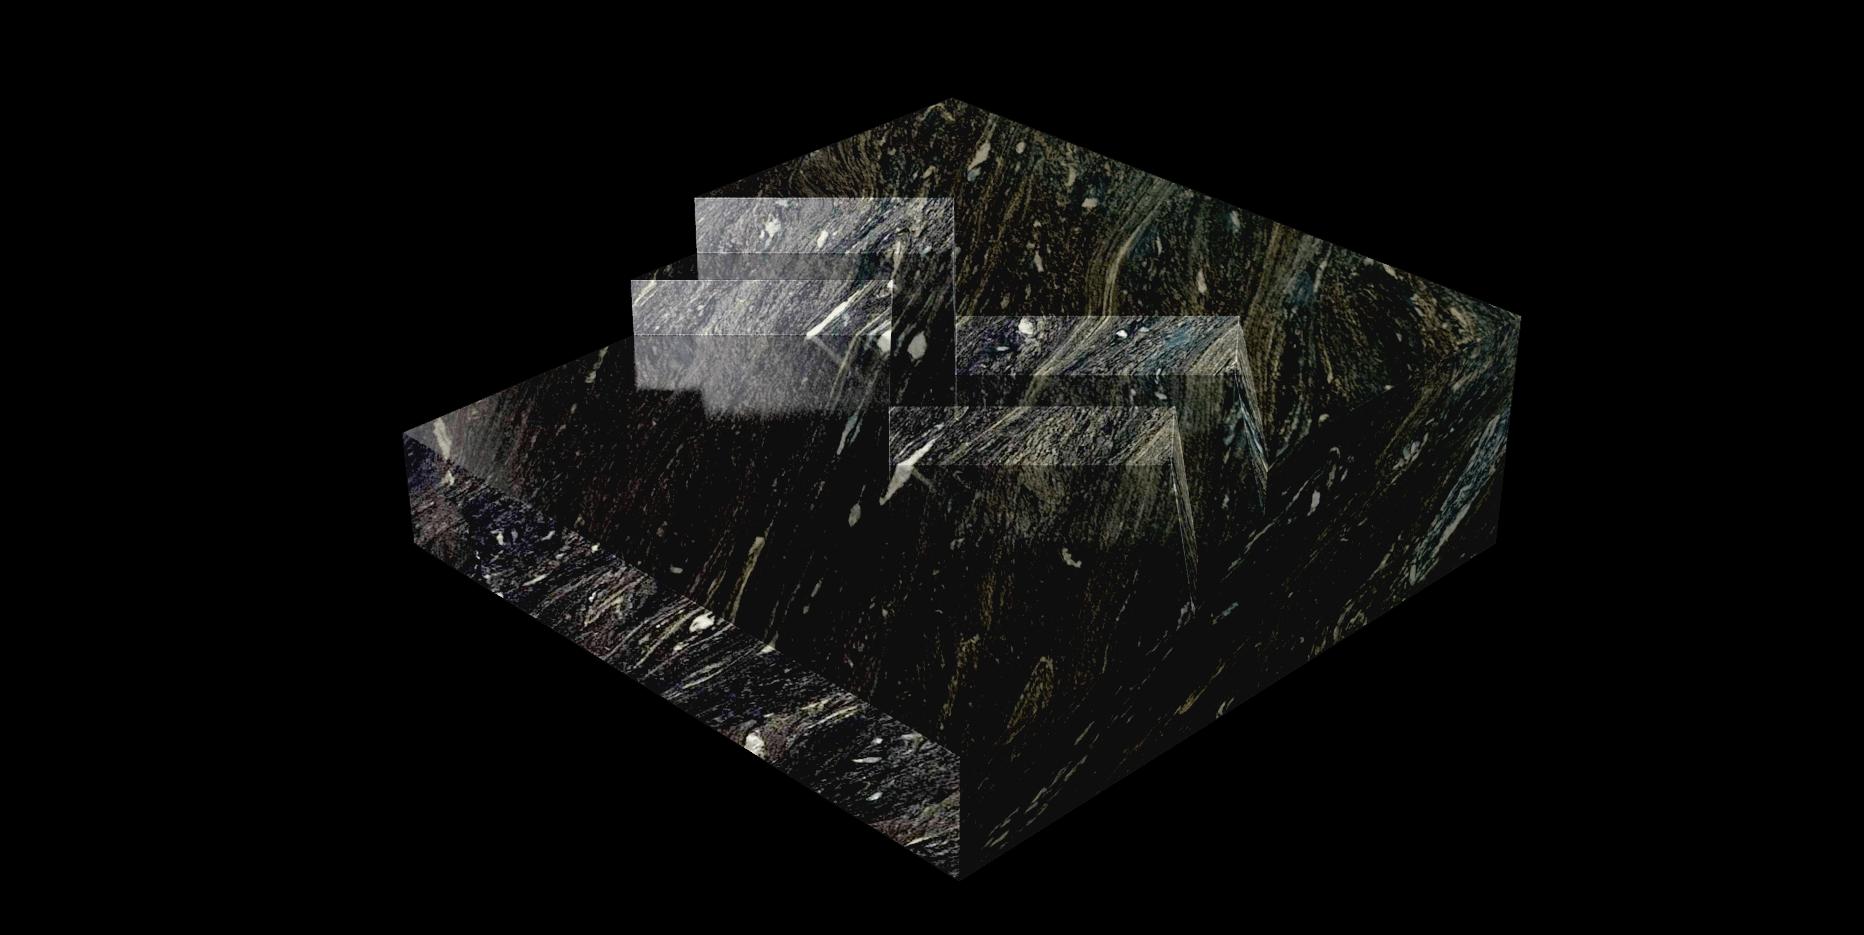 Scorpio фото 2 — камень от Bevers Marmyr